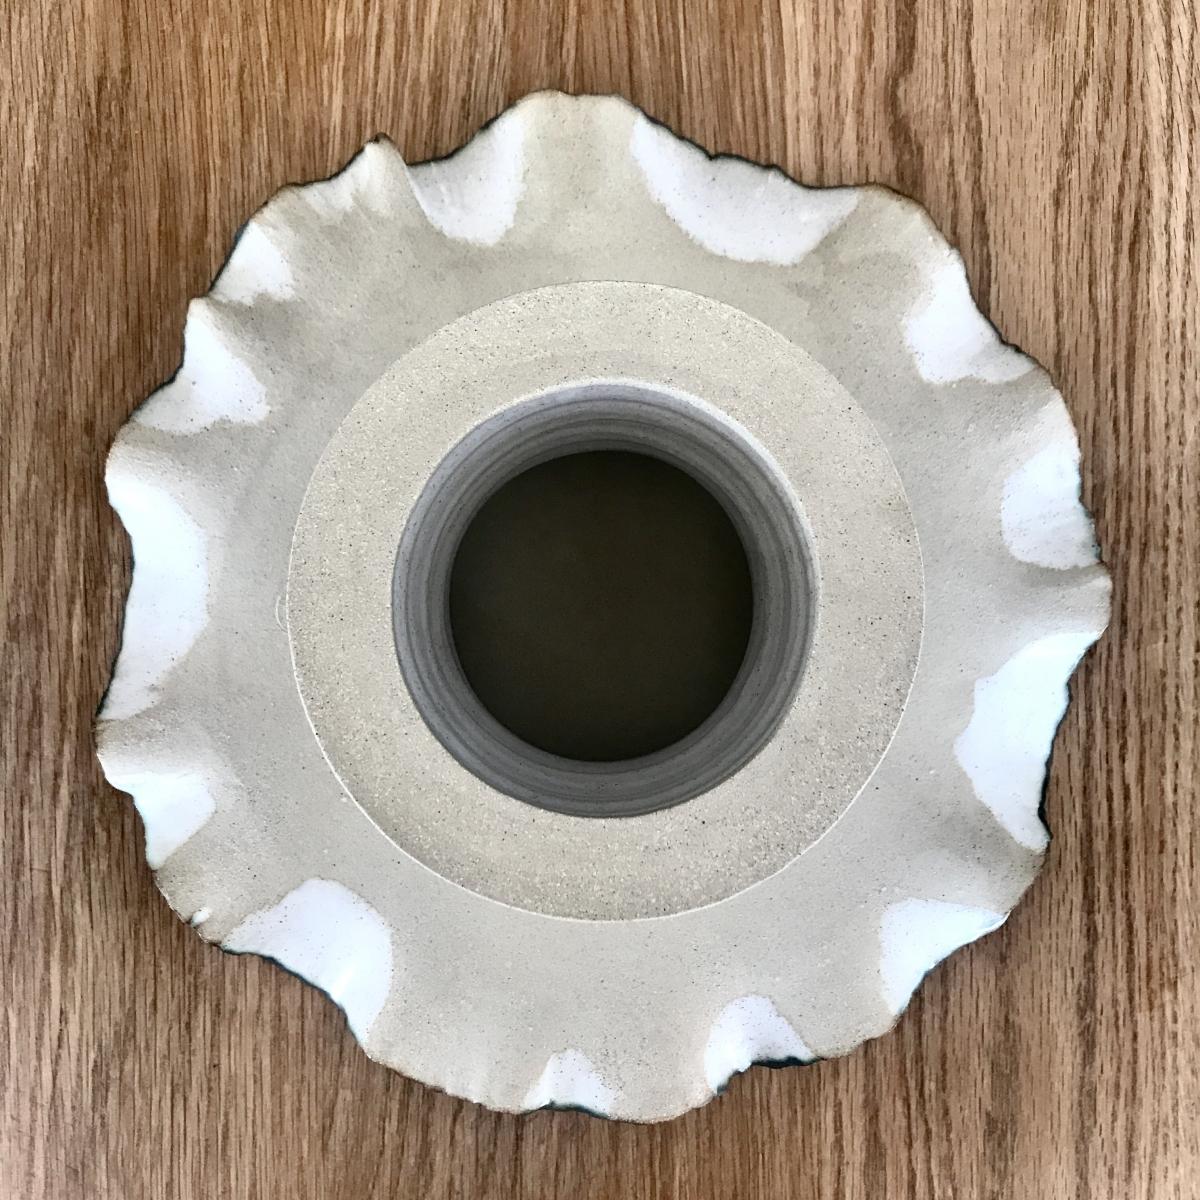 Pond Lily Leaf Cake Stand (base underside profile) by Sonya Ceramic Art